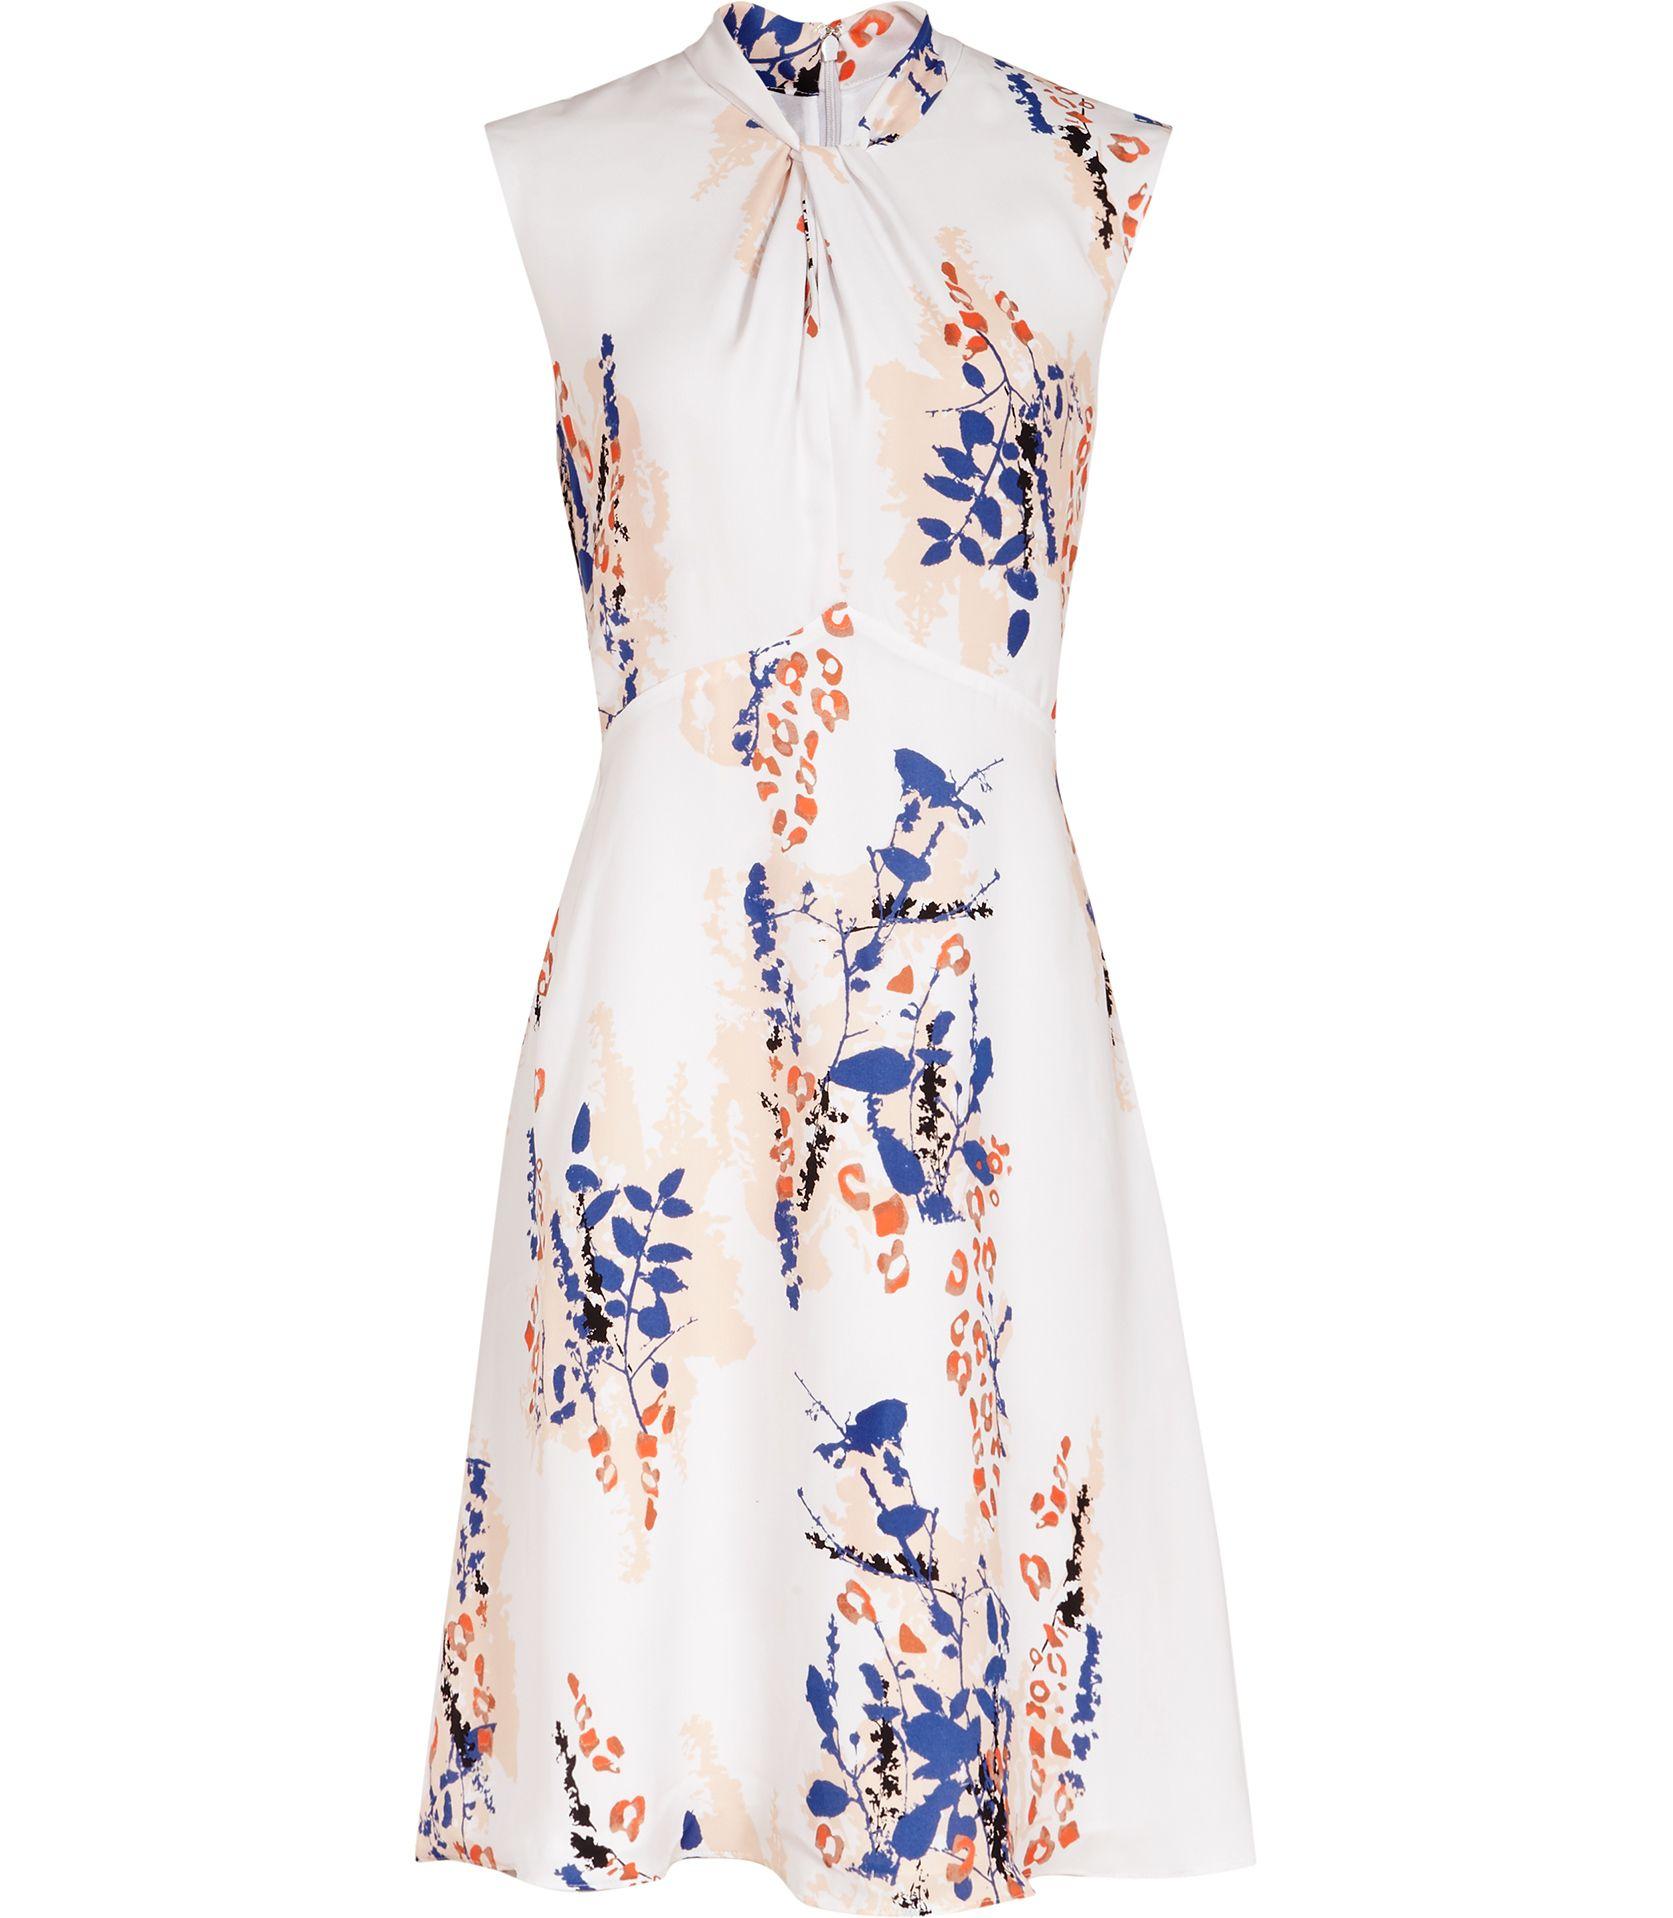 5177d28dc8c1 Womens Multi Neutrals Printed Dress - Reiss Cosmic Floral Print Maxi Dress